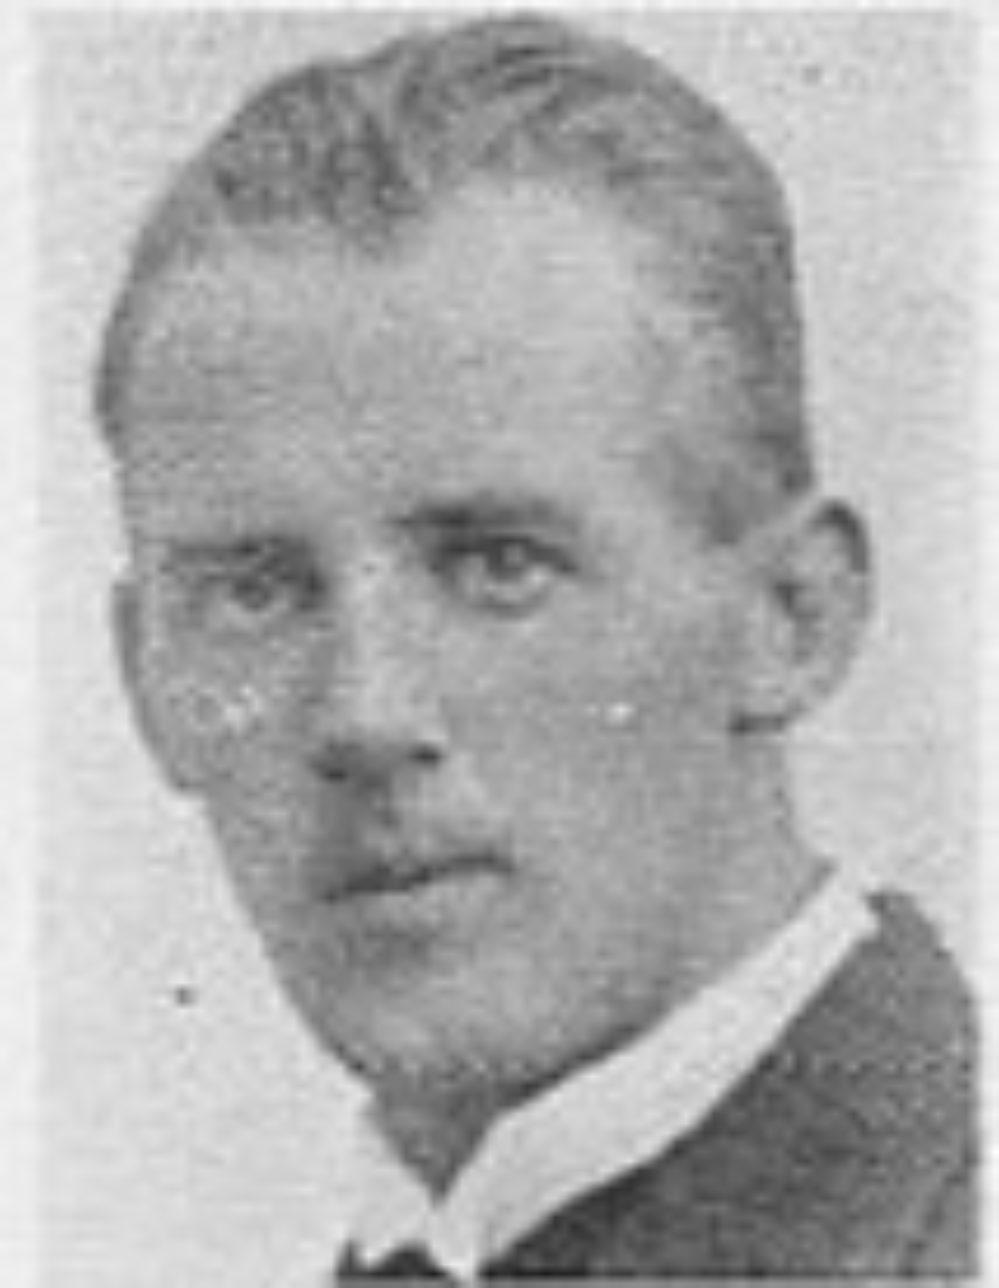 Fredmar Bjarne Johannessen